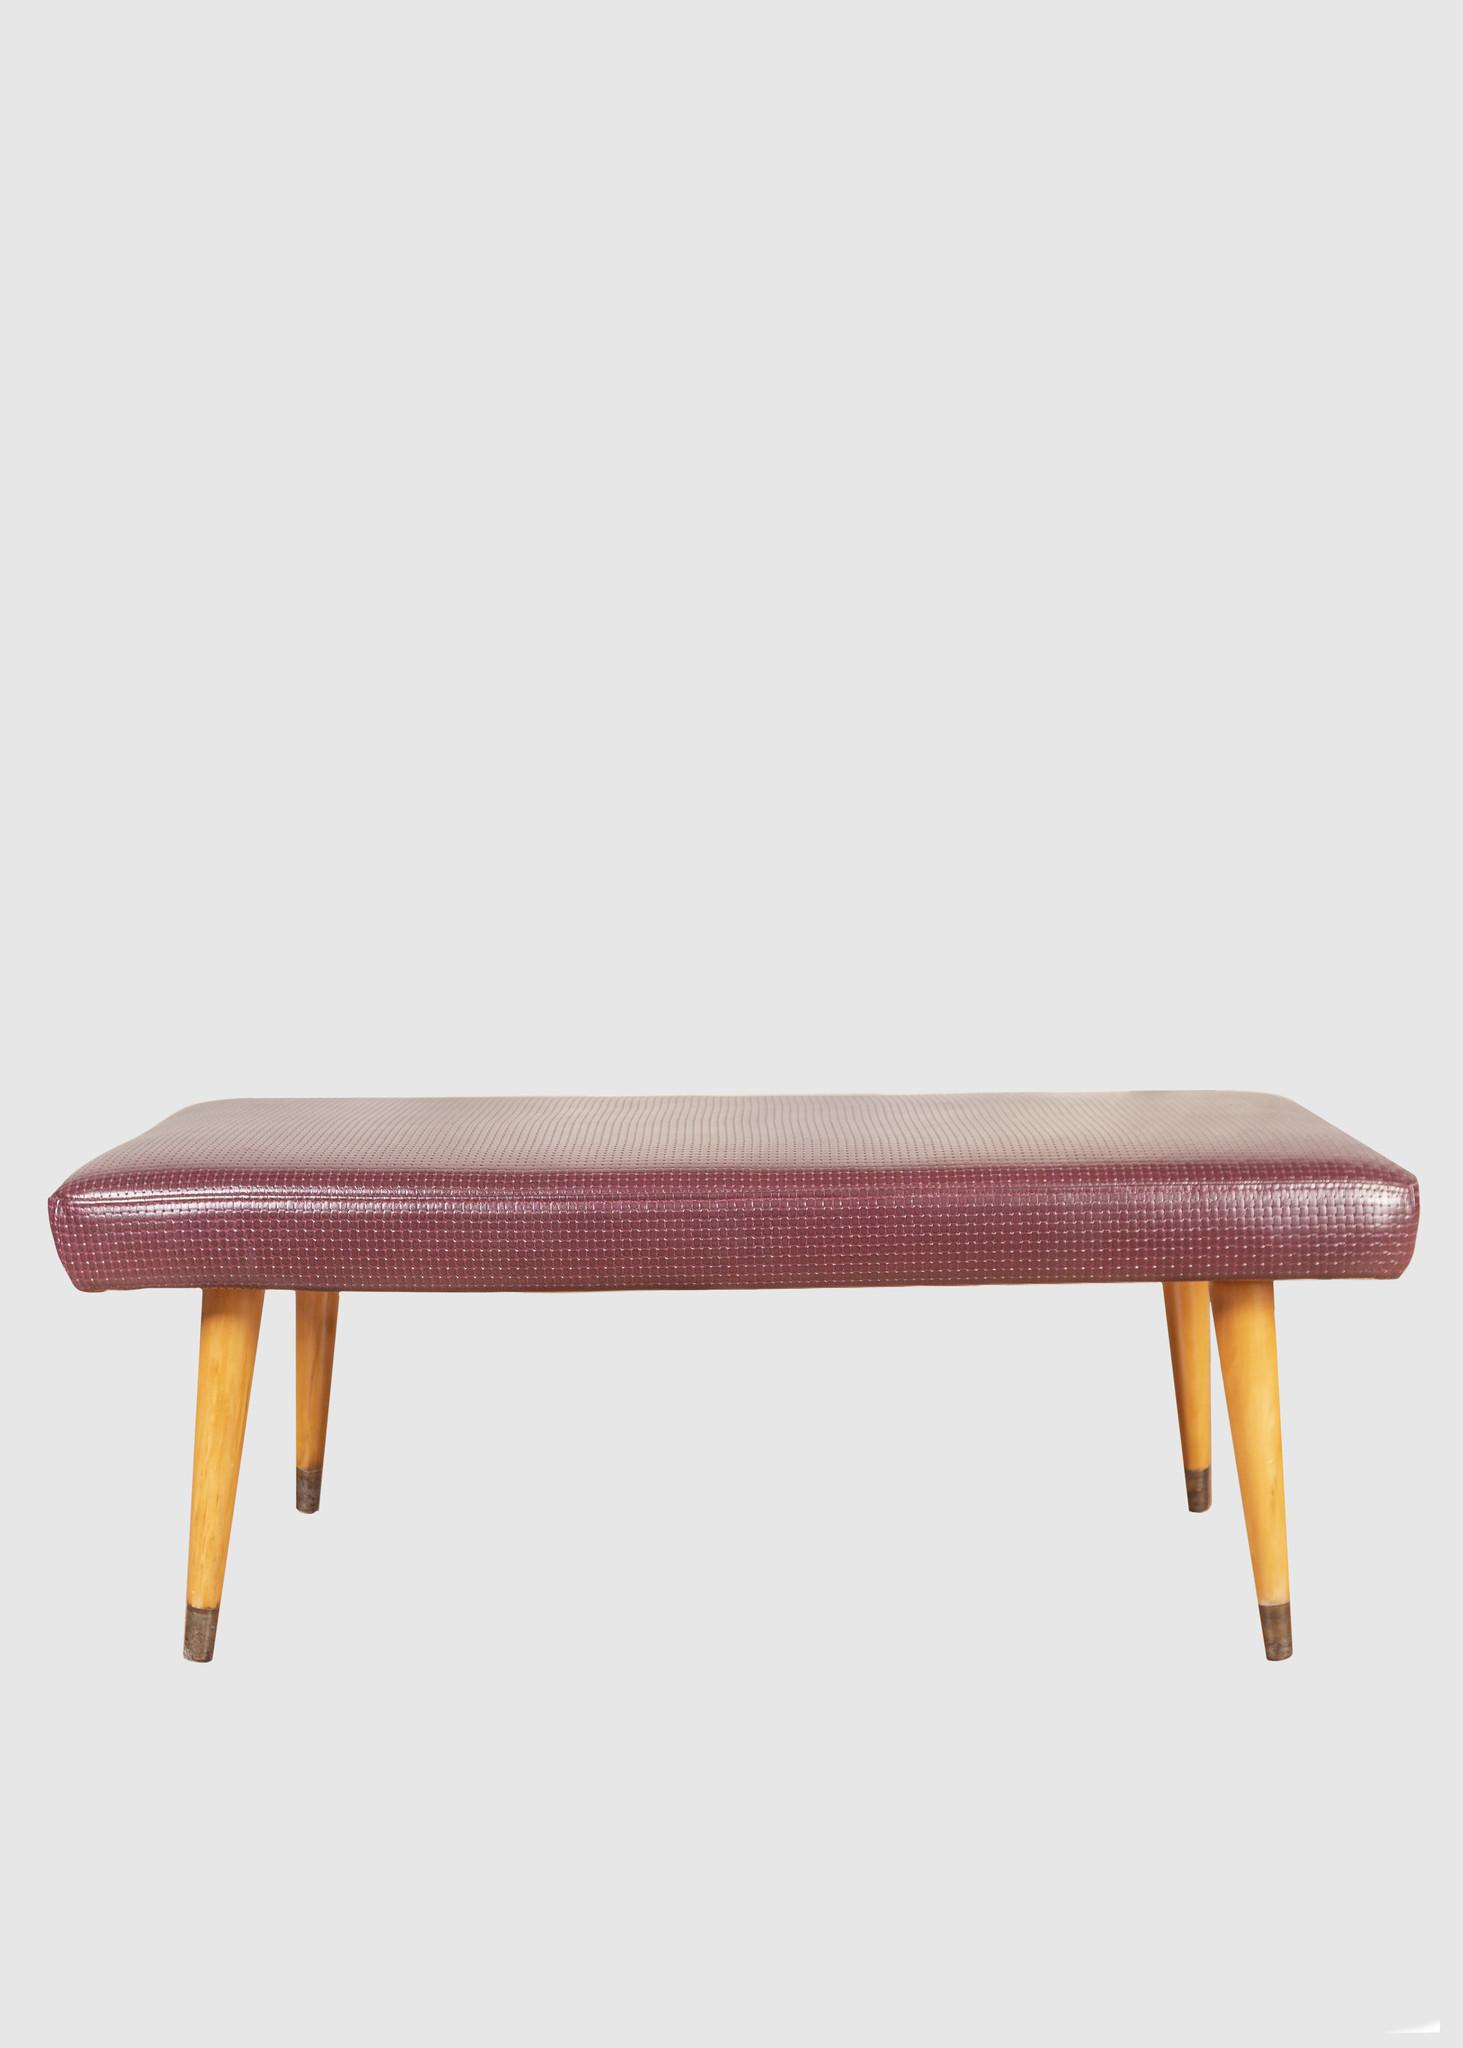 Marvelous Eskell Woven Leather Ottoman Eskell Lamtechconsult Wood Chair Design Ideas Lamtechconsultcom